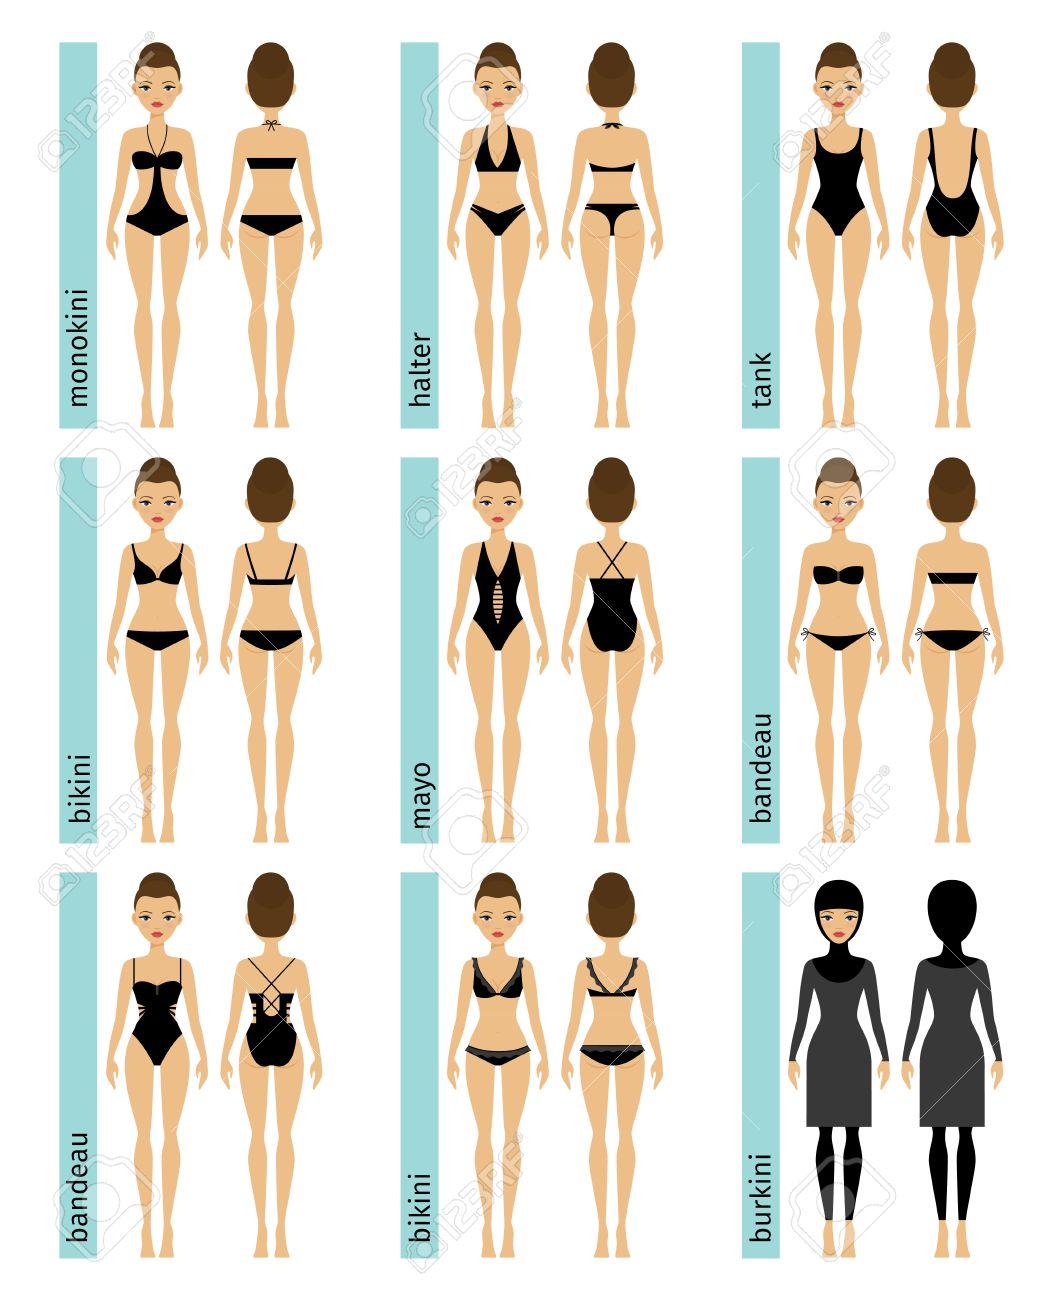 f42c58002f3 写真素材 - 女性水着のイラスト。水着の種類。ビキニ、タンキニ、モノキニとムスリム